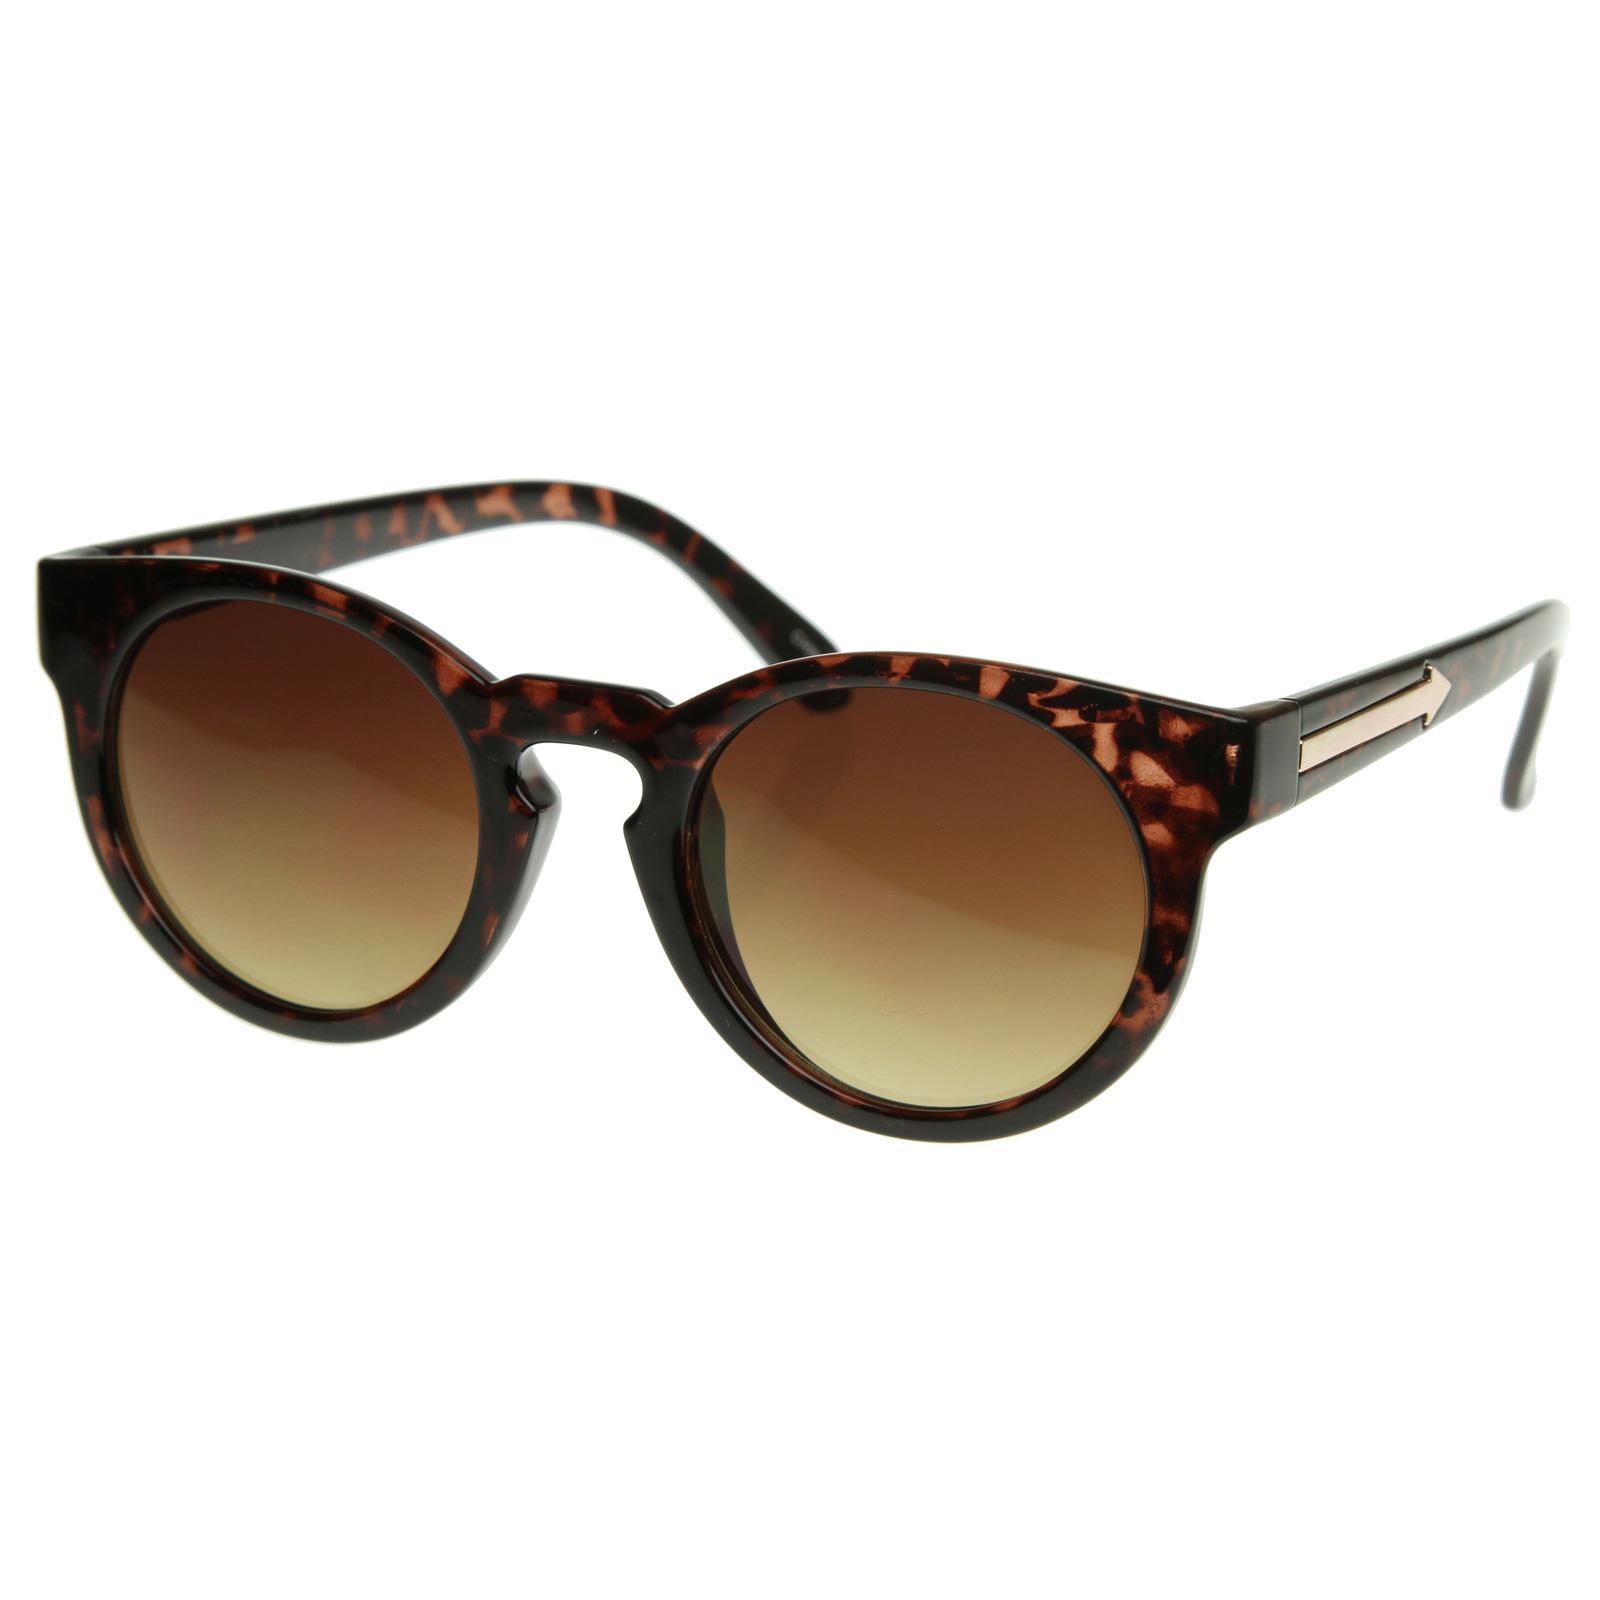 c5afe1f2c5bd Circular Sunglasses Ebay